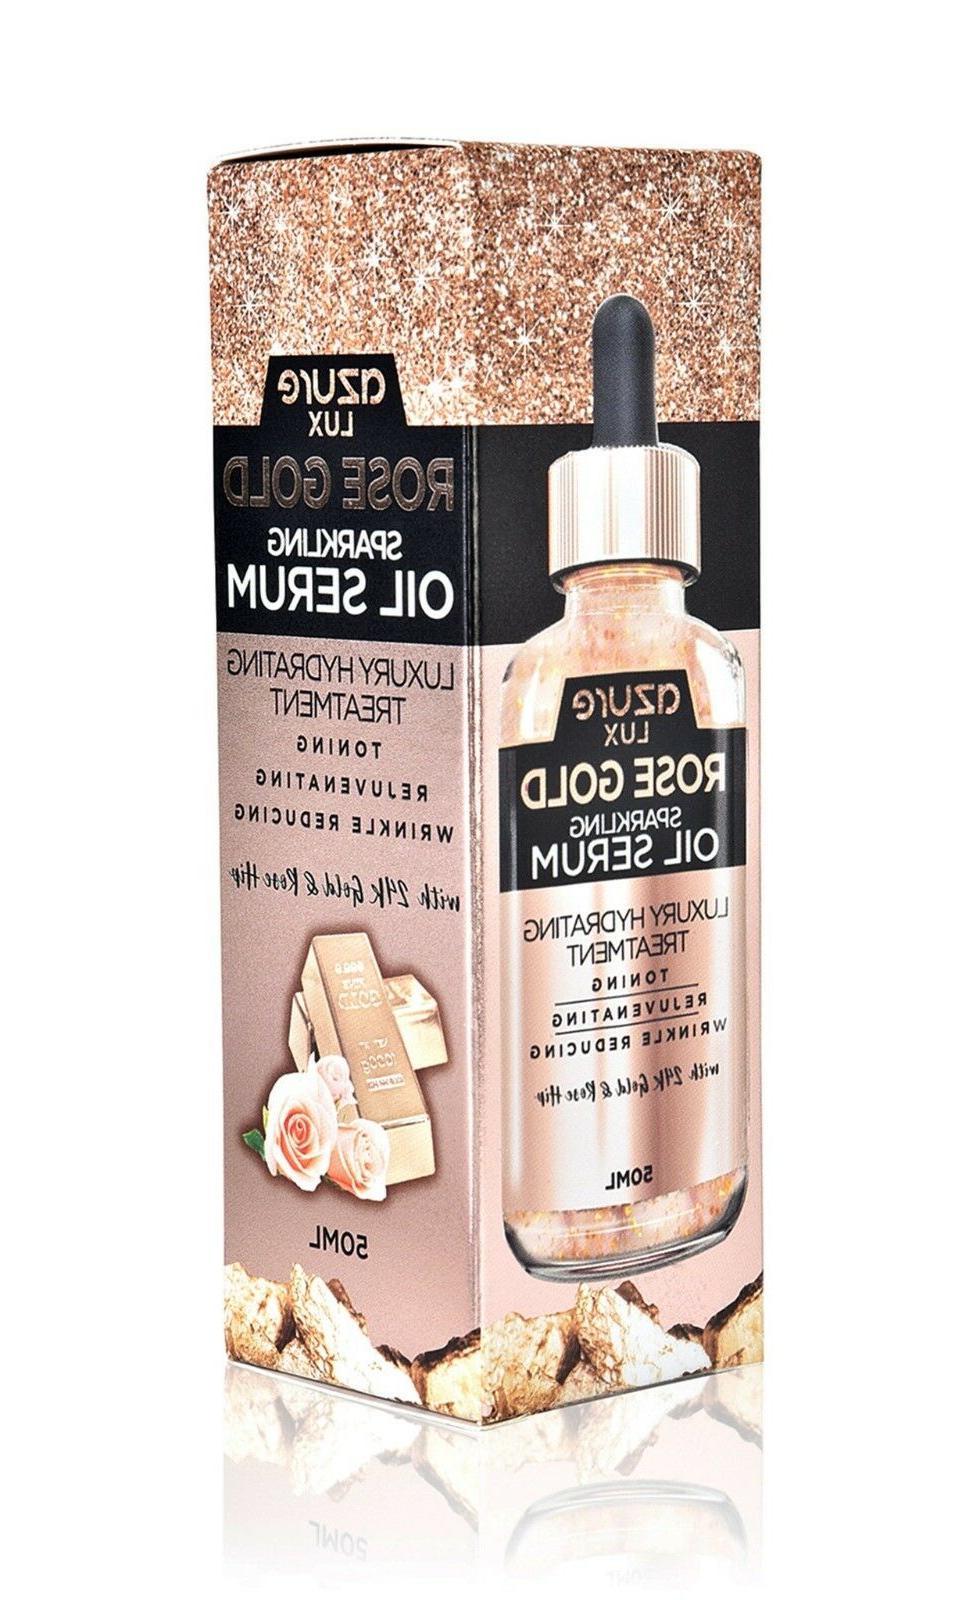 Azure Luxury Rose Gold Sparkling Oil Serum Hydrating Anti-Ag